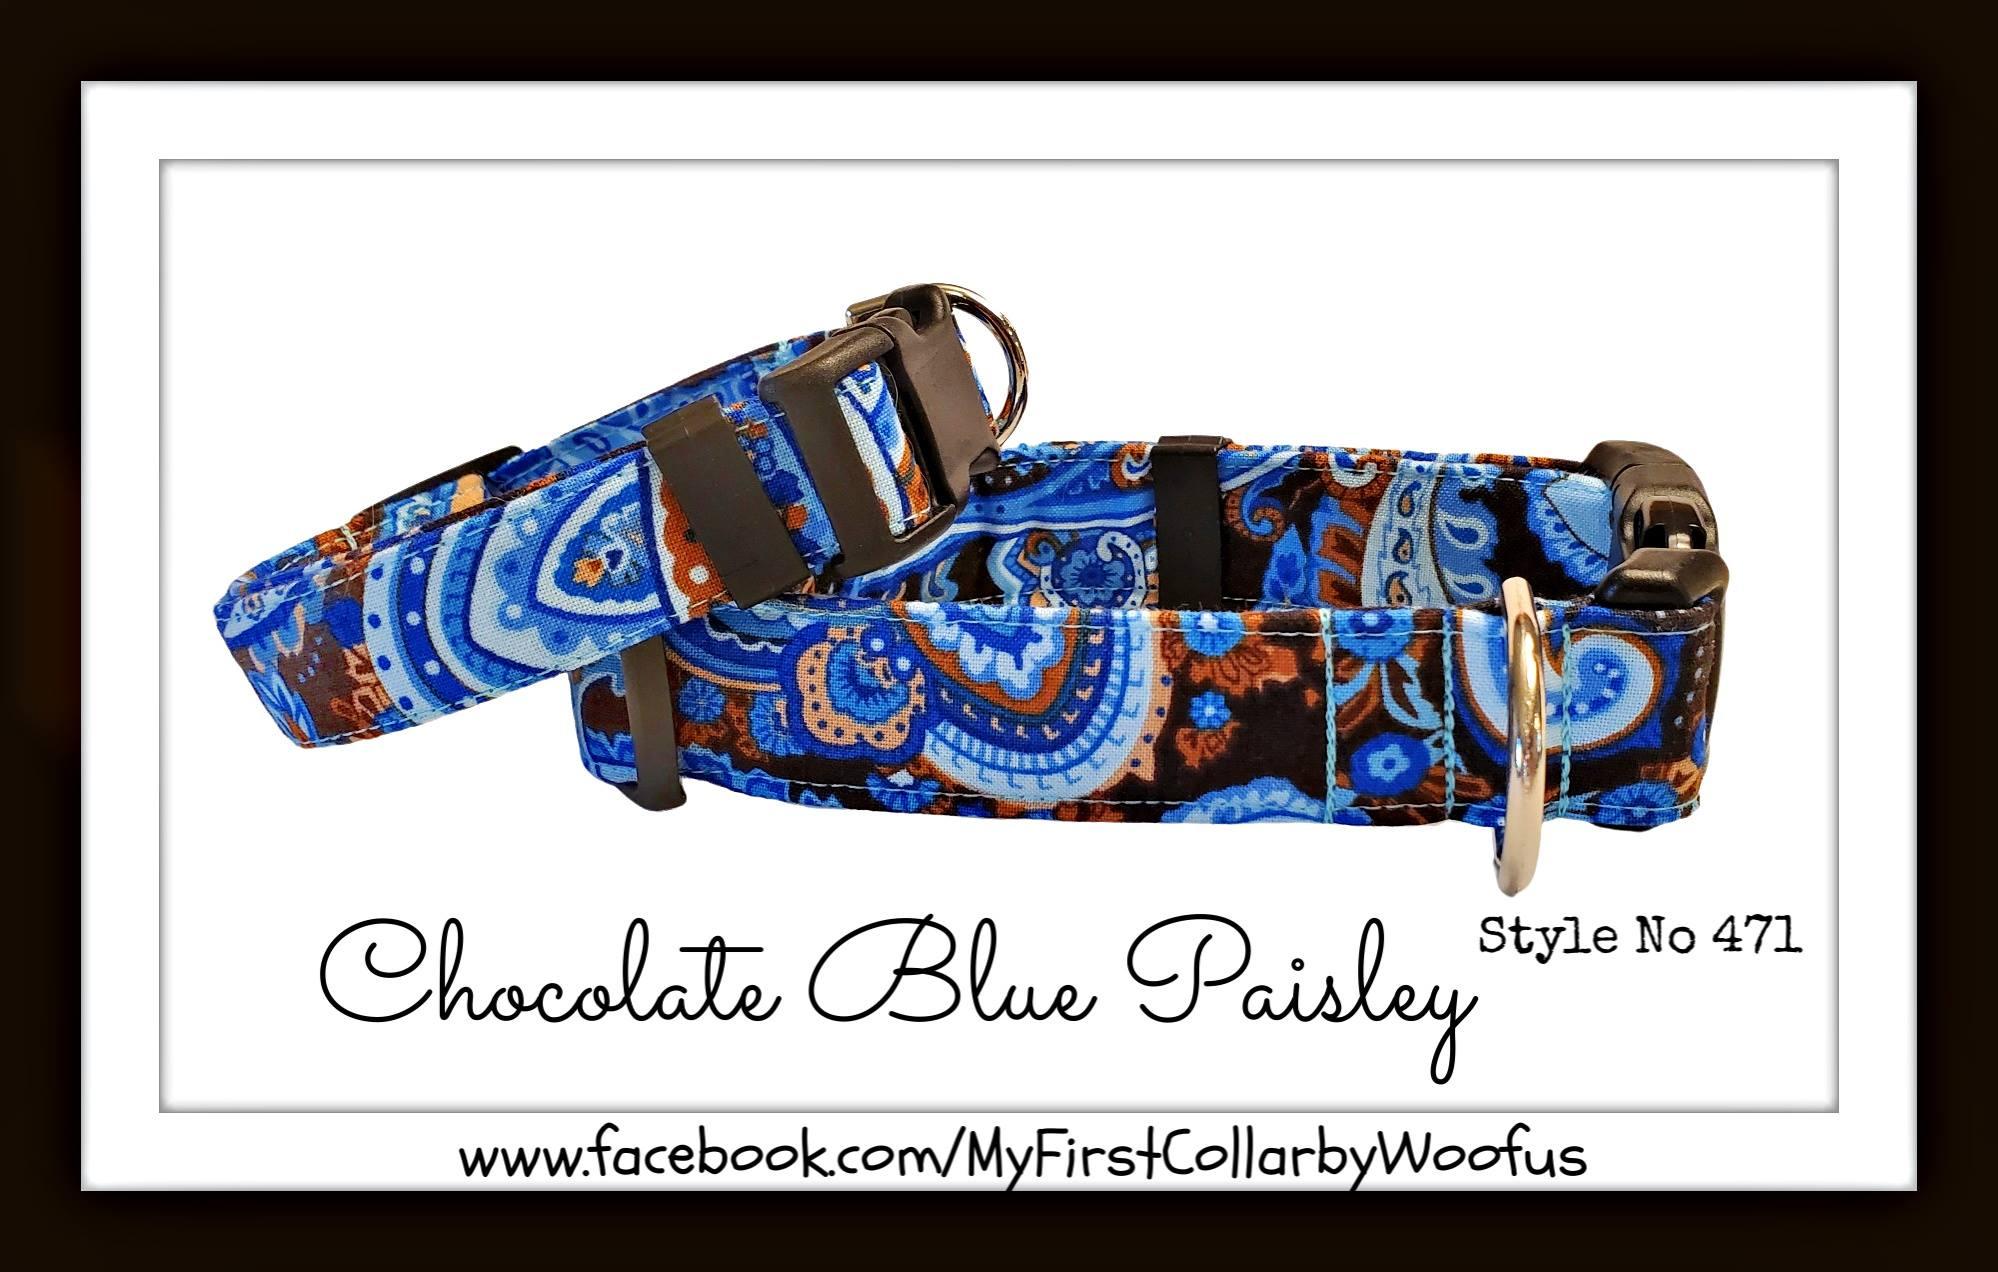 Chocolate Blue Paisley 471